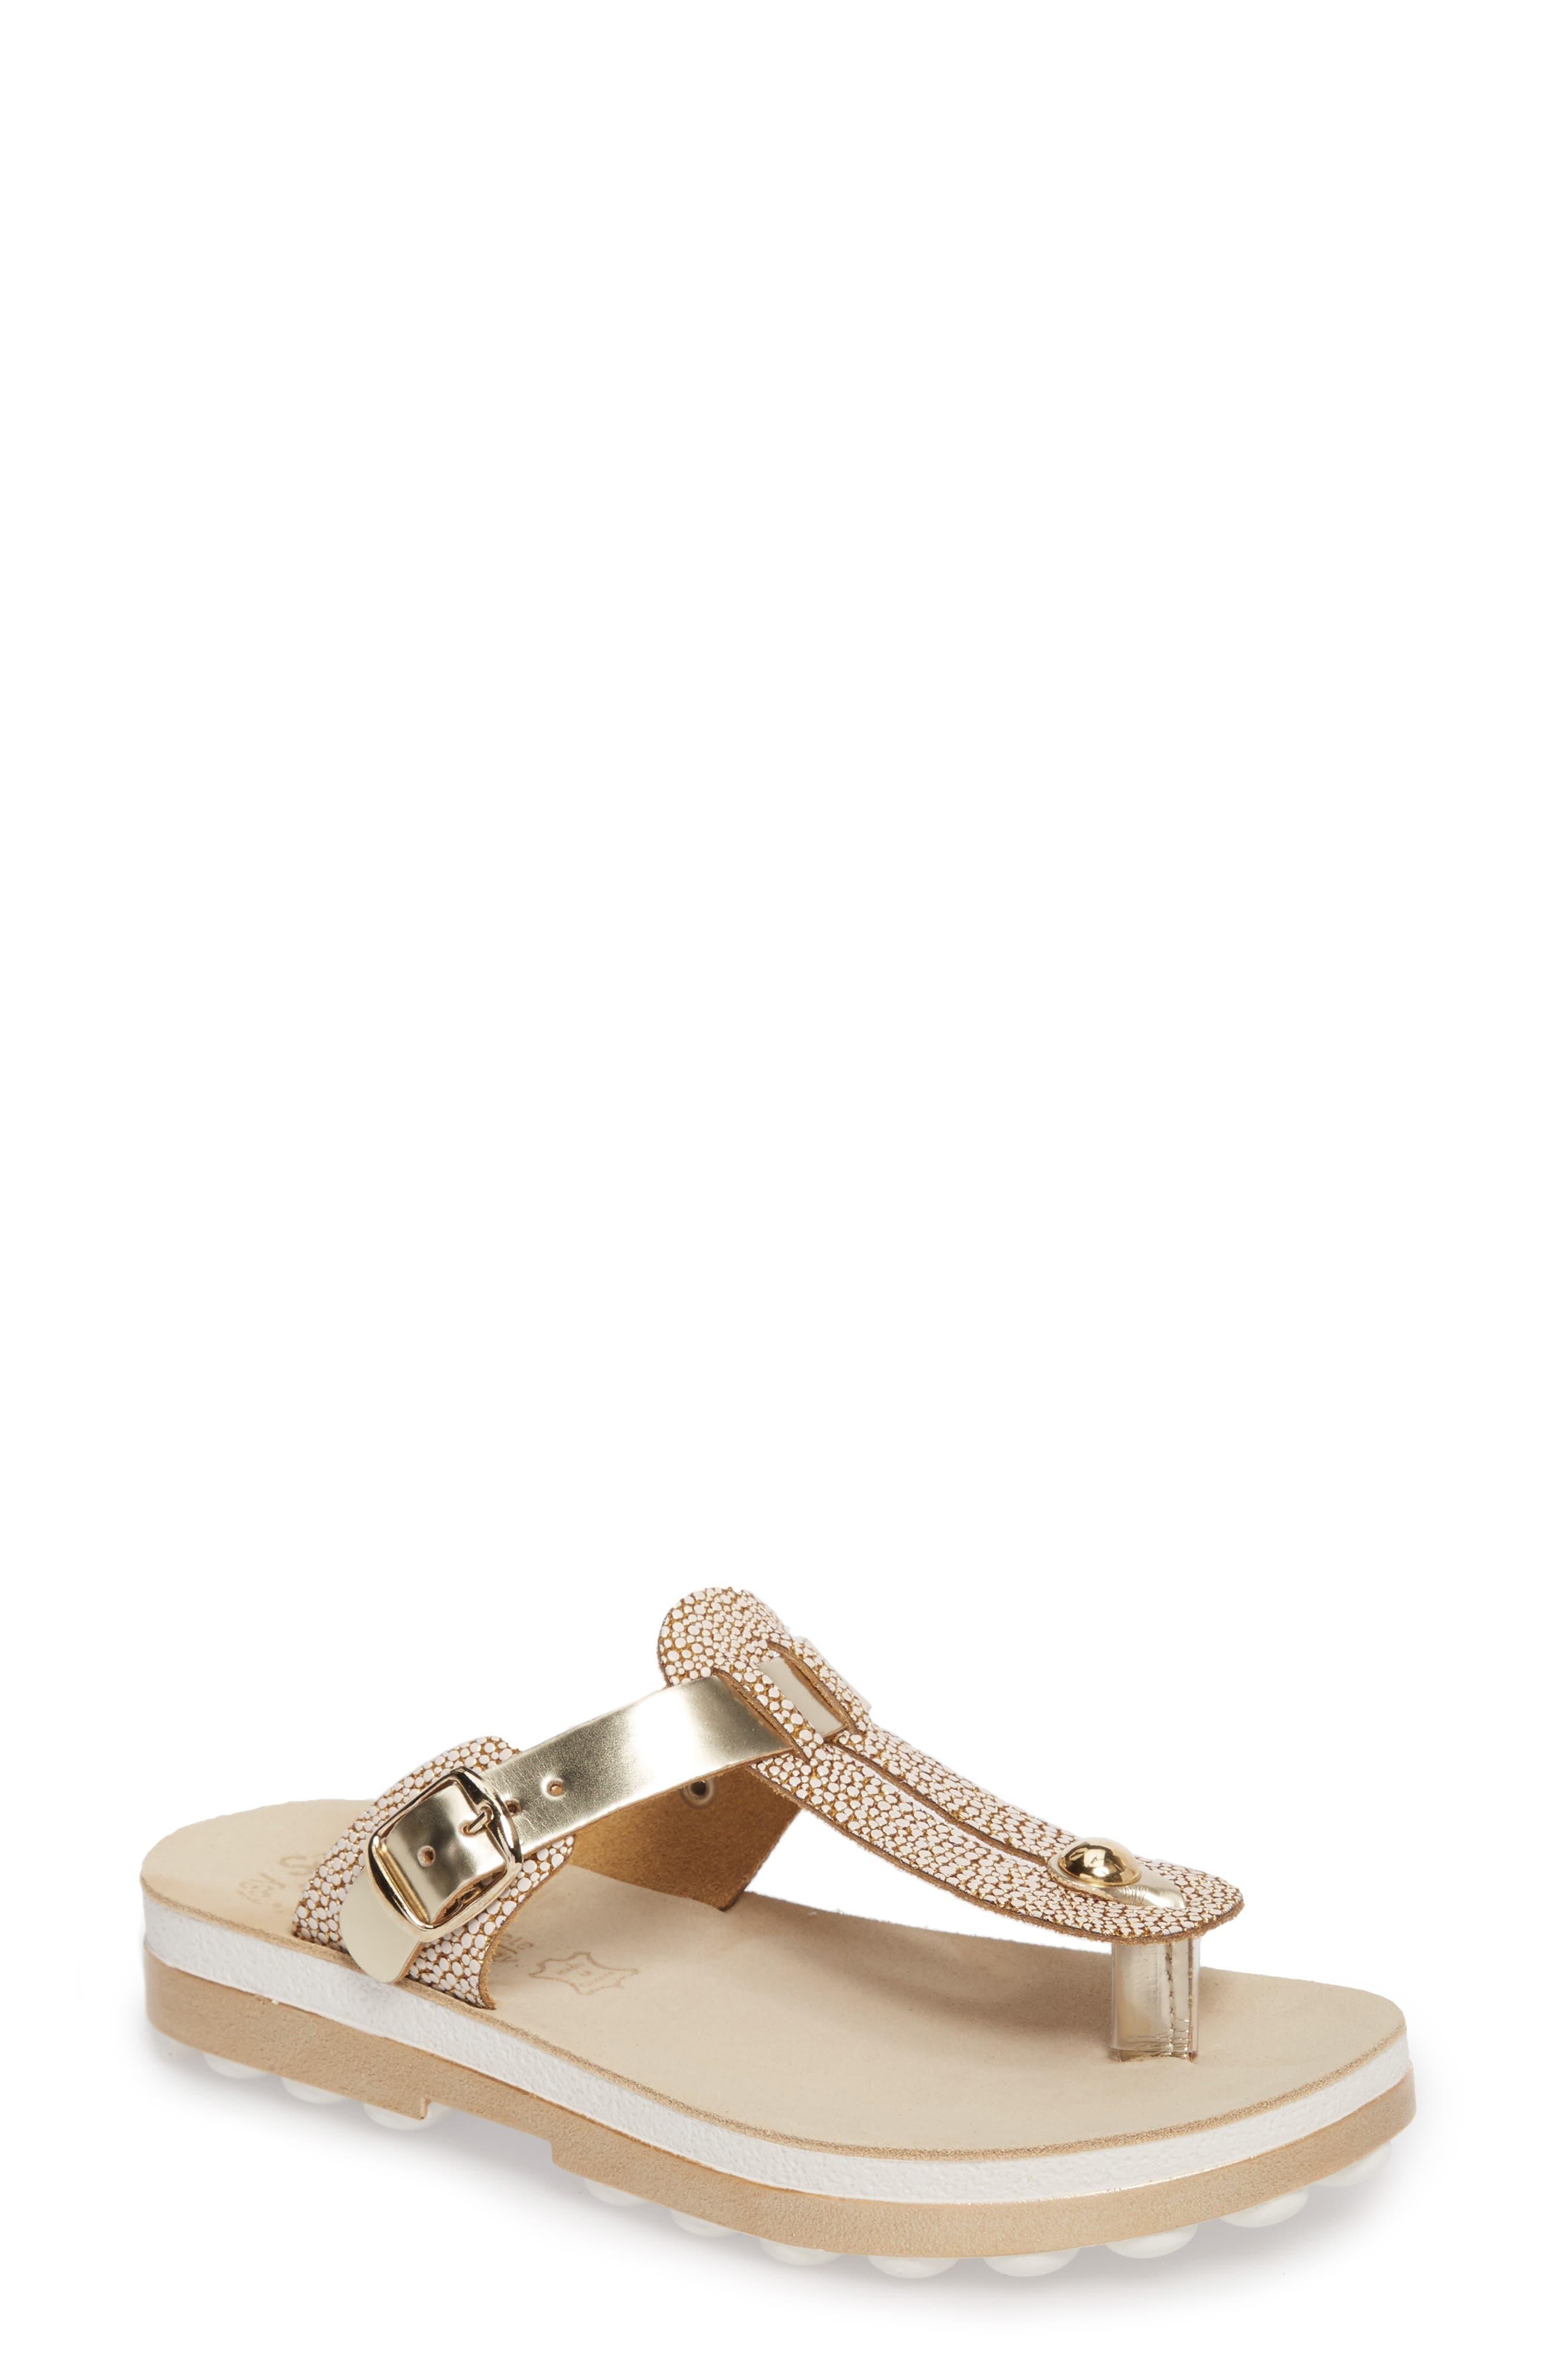 Mirabella Fantasy Sandal,                         Main,                         color, Gold Caviar Leather